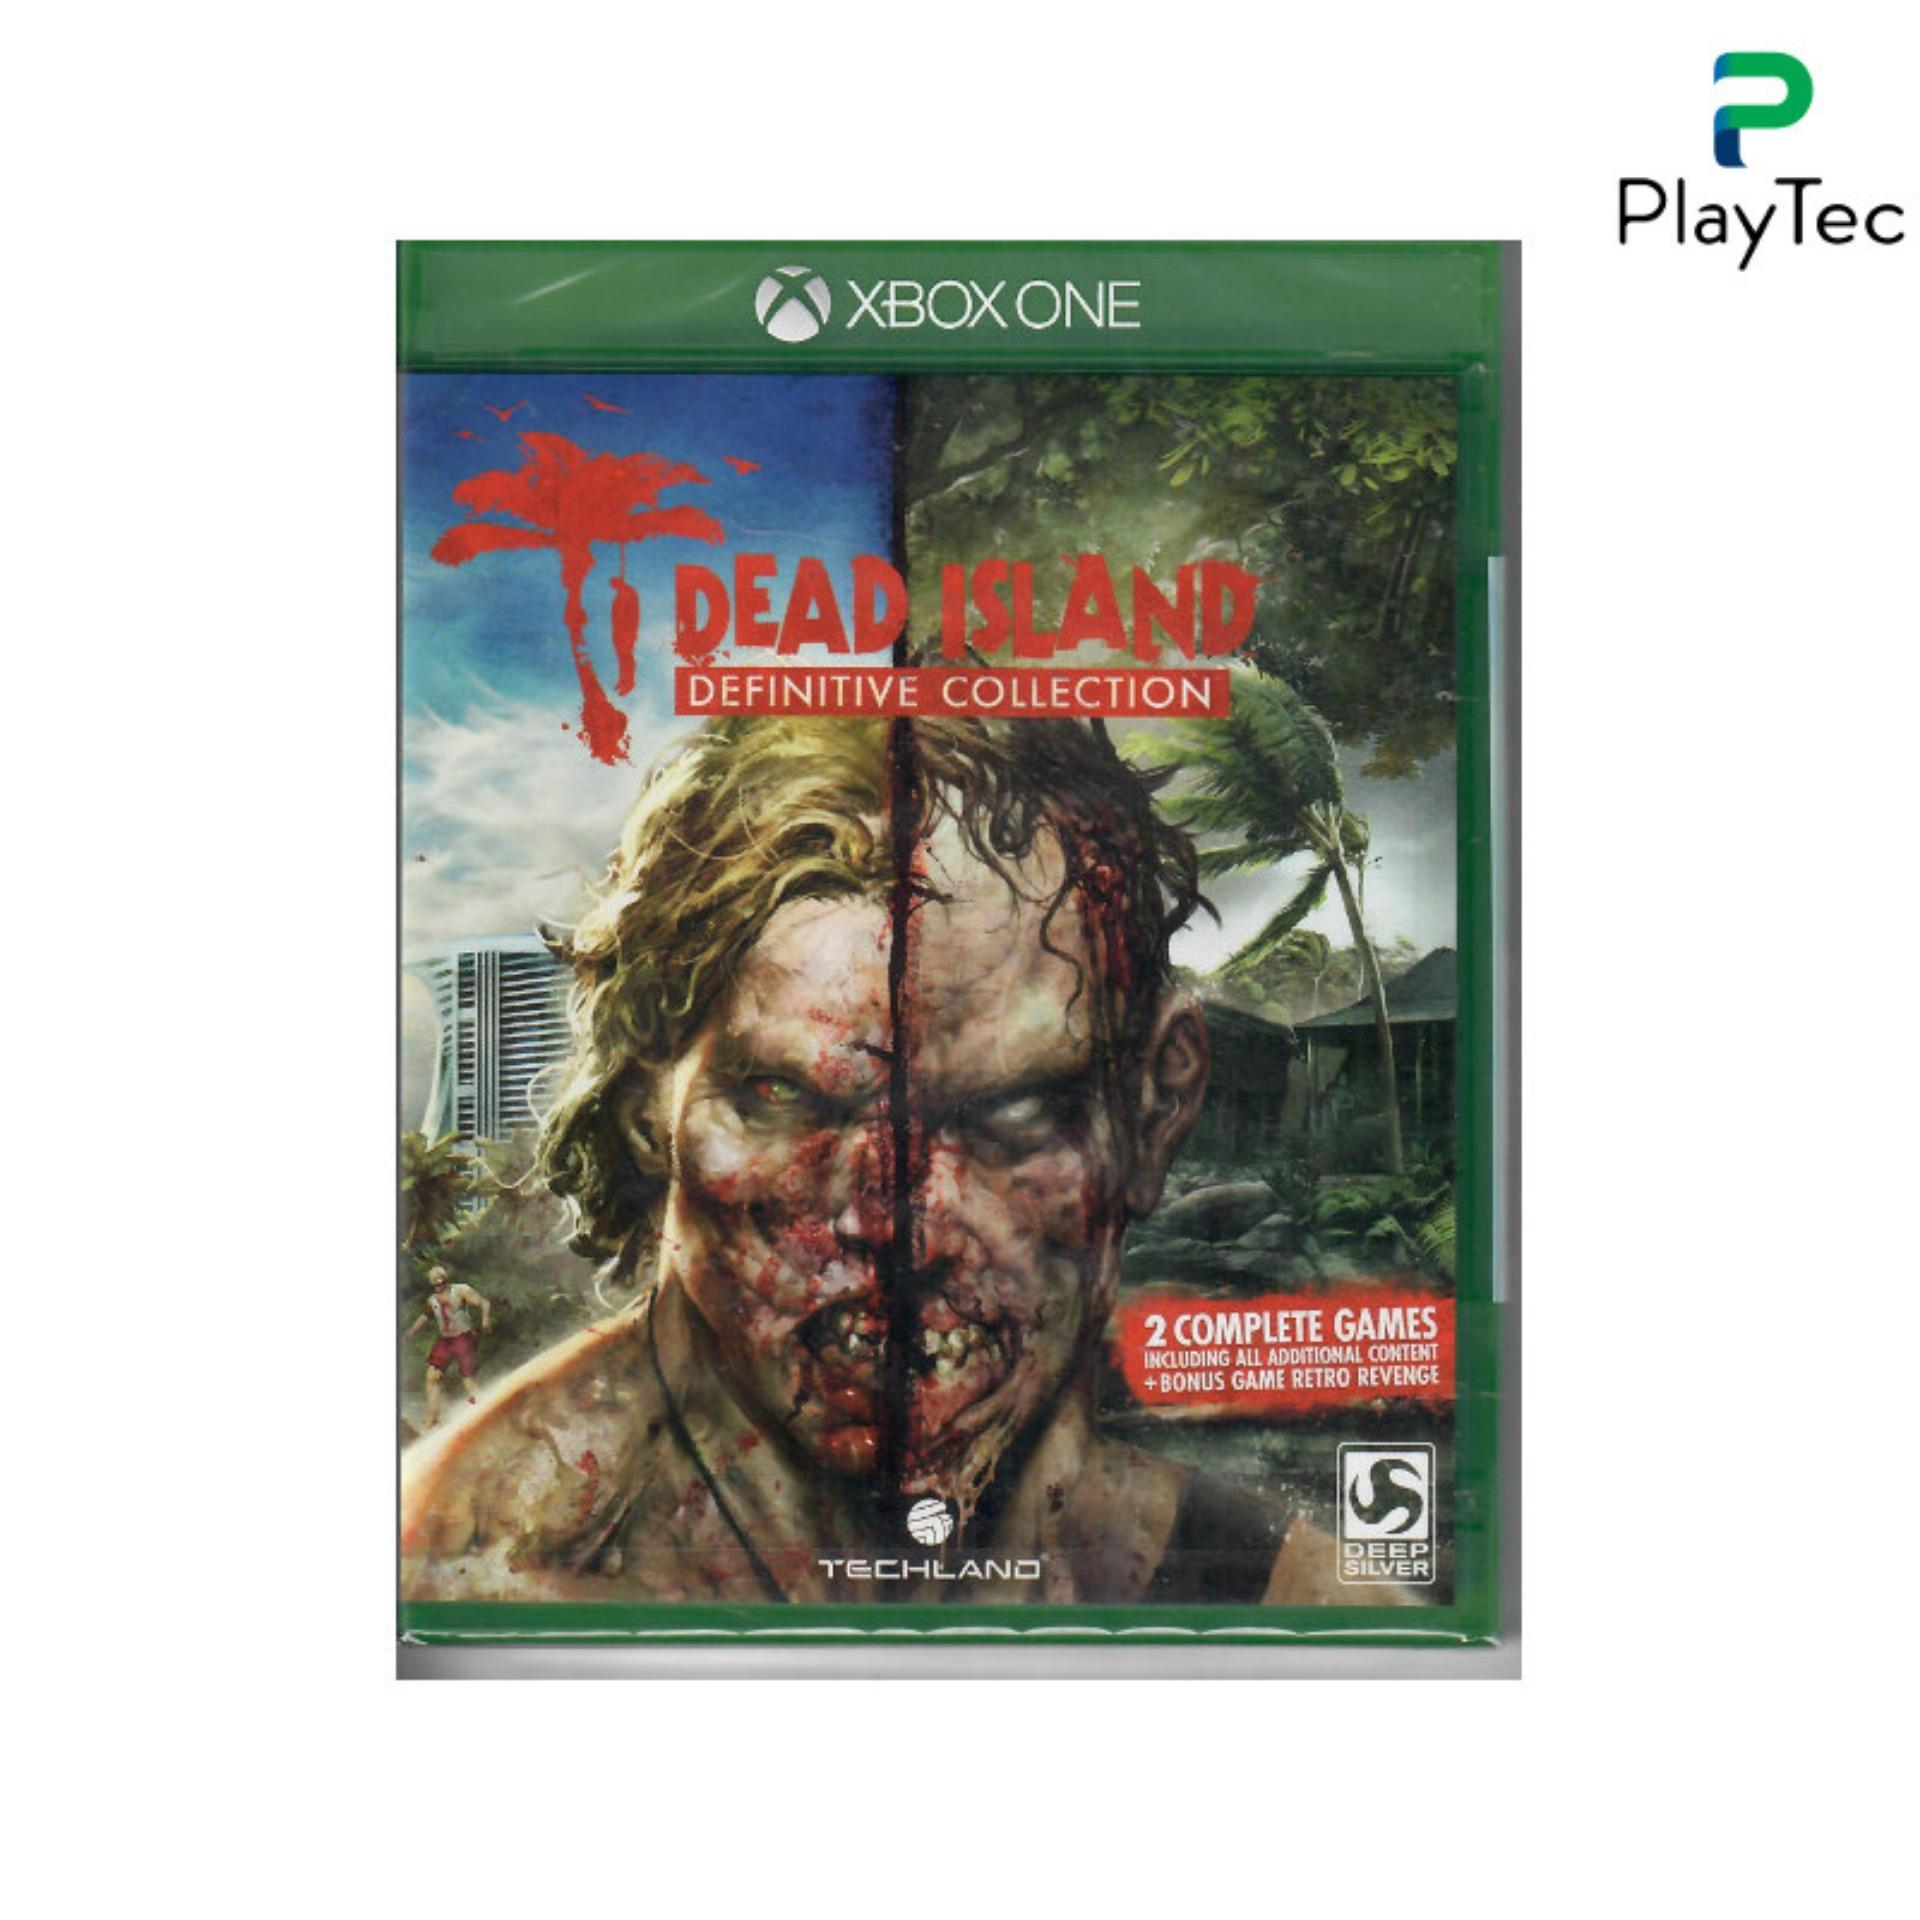 XBOX One Dead Island Definitive Edition (R3)